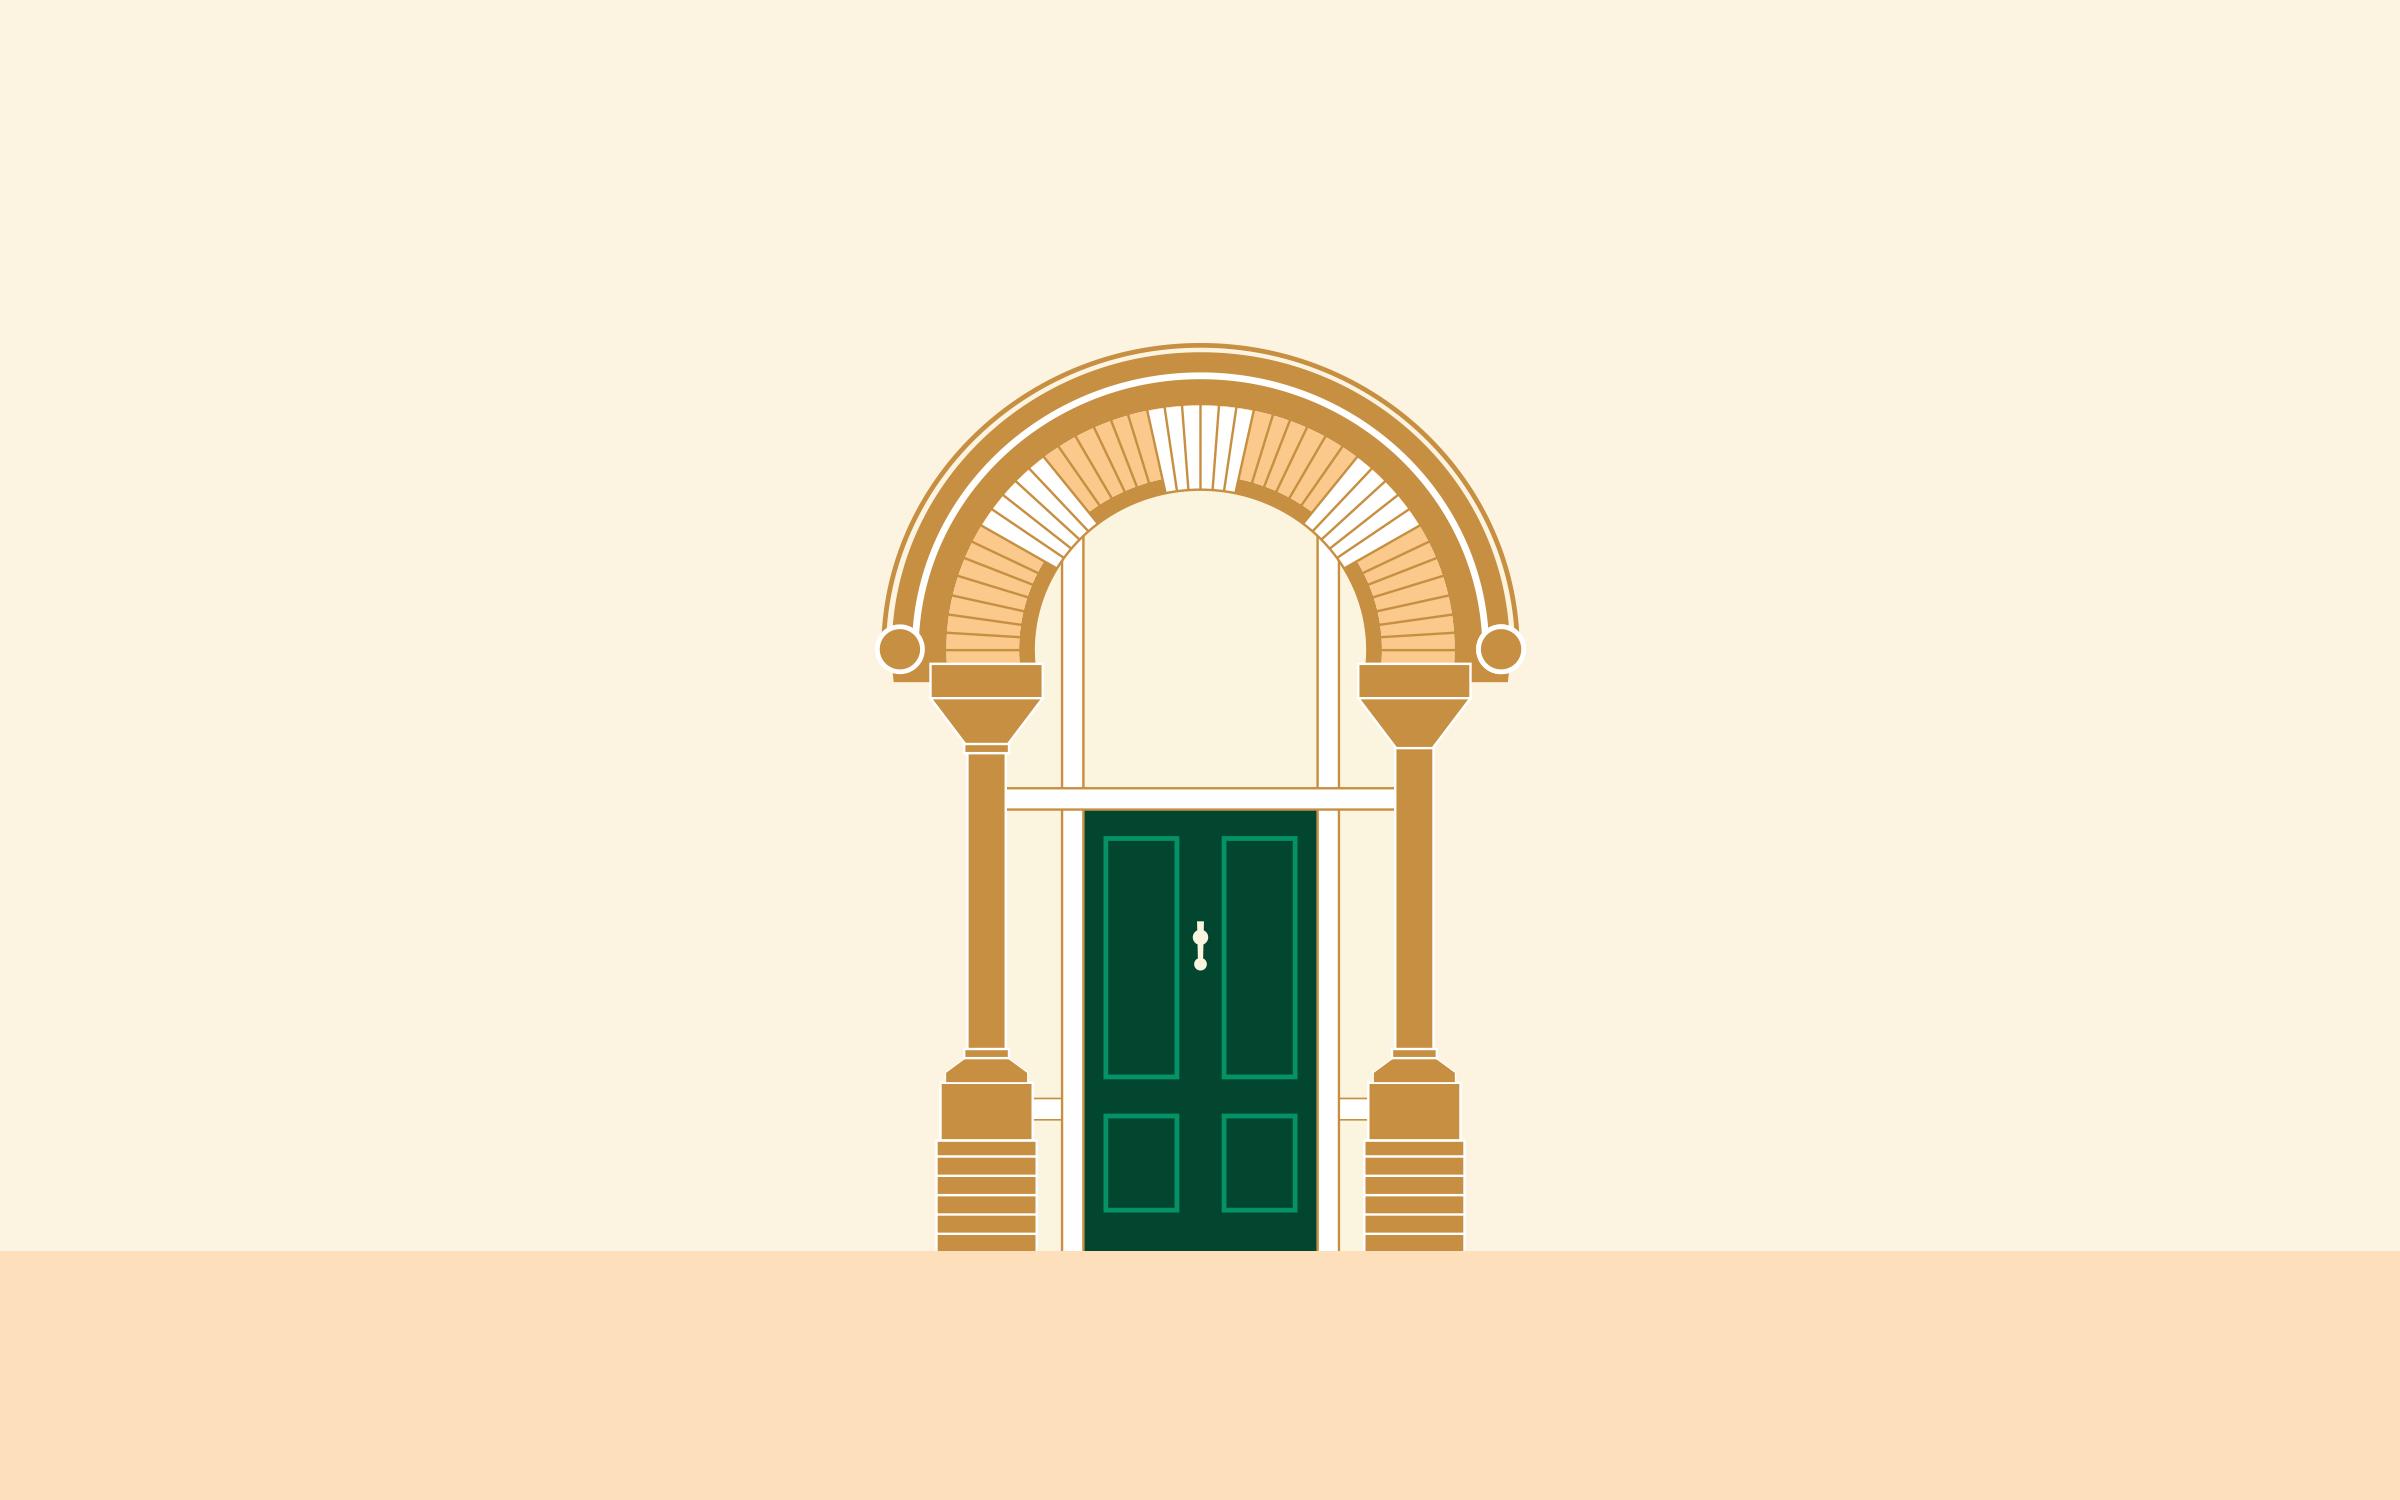 Identity element featuring office door